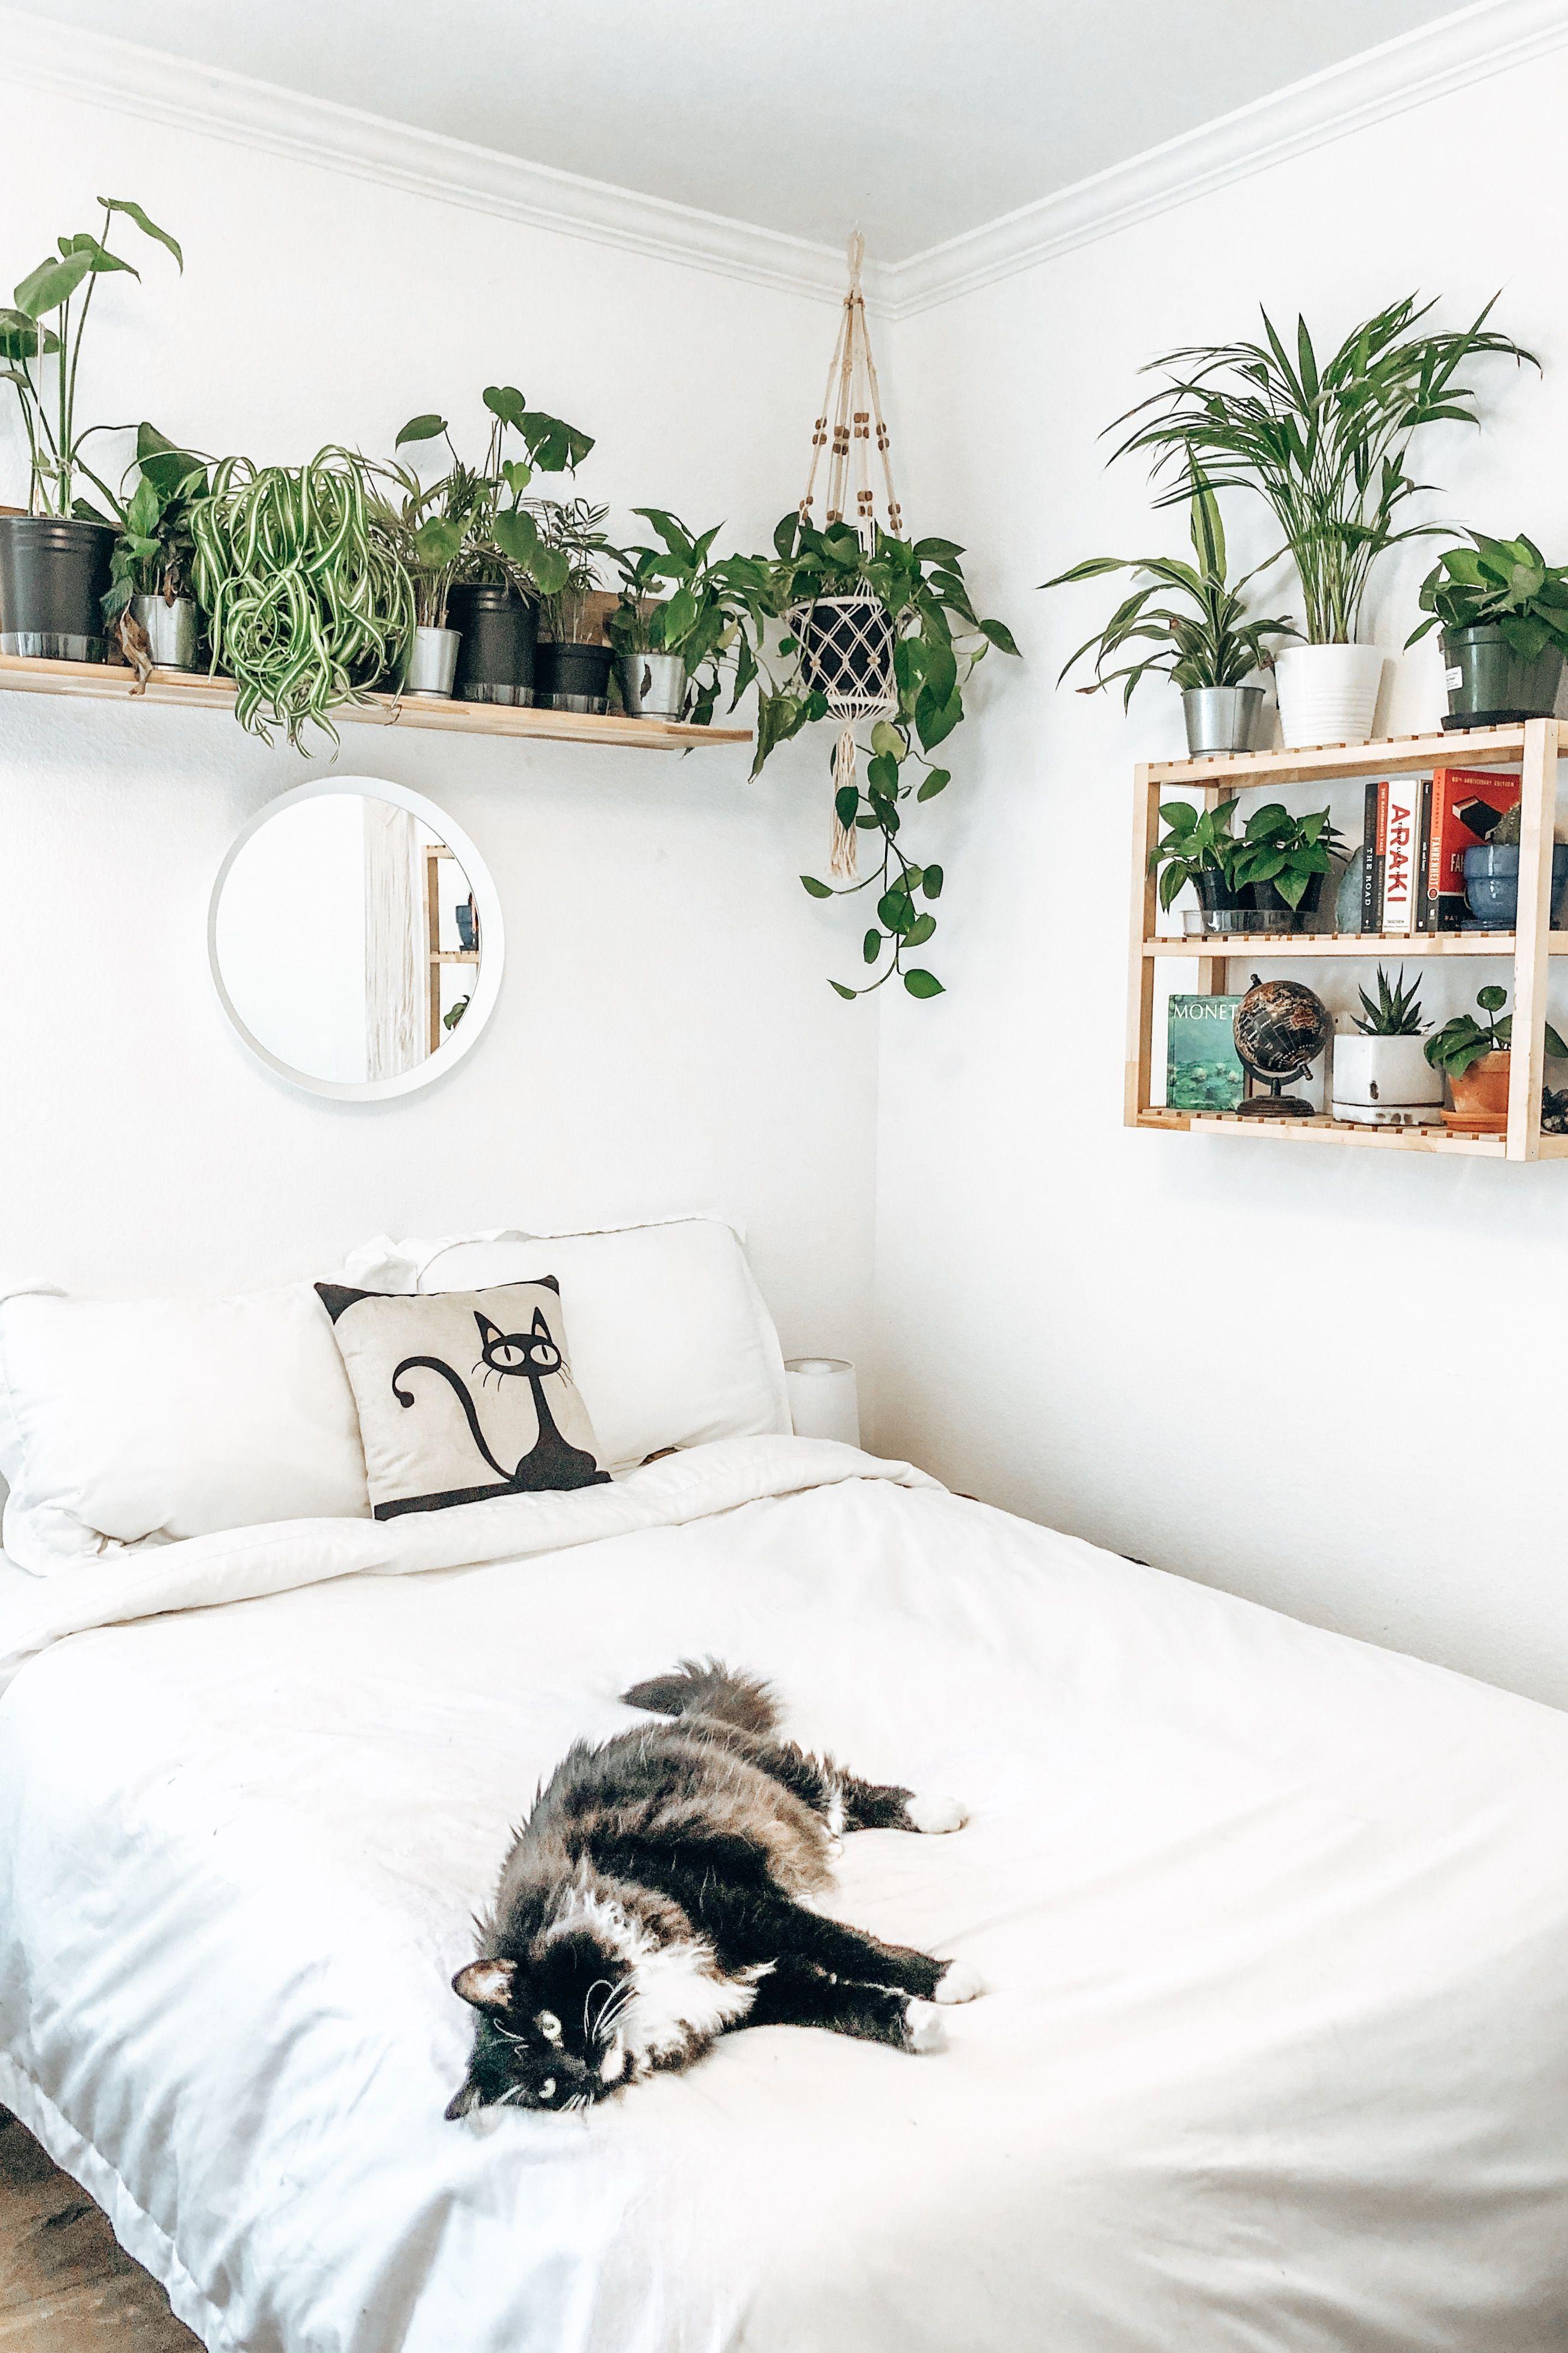 How To Turn Any Space Into An Urban Jungle Kessler Ramirez Art Travel Room With Plants Shelf Decor Bedroom Jungle Room